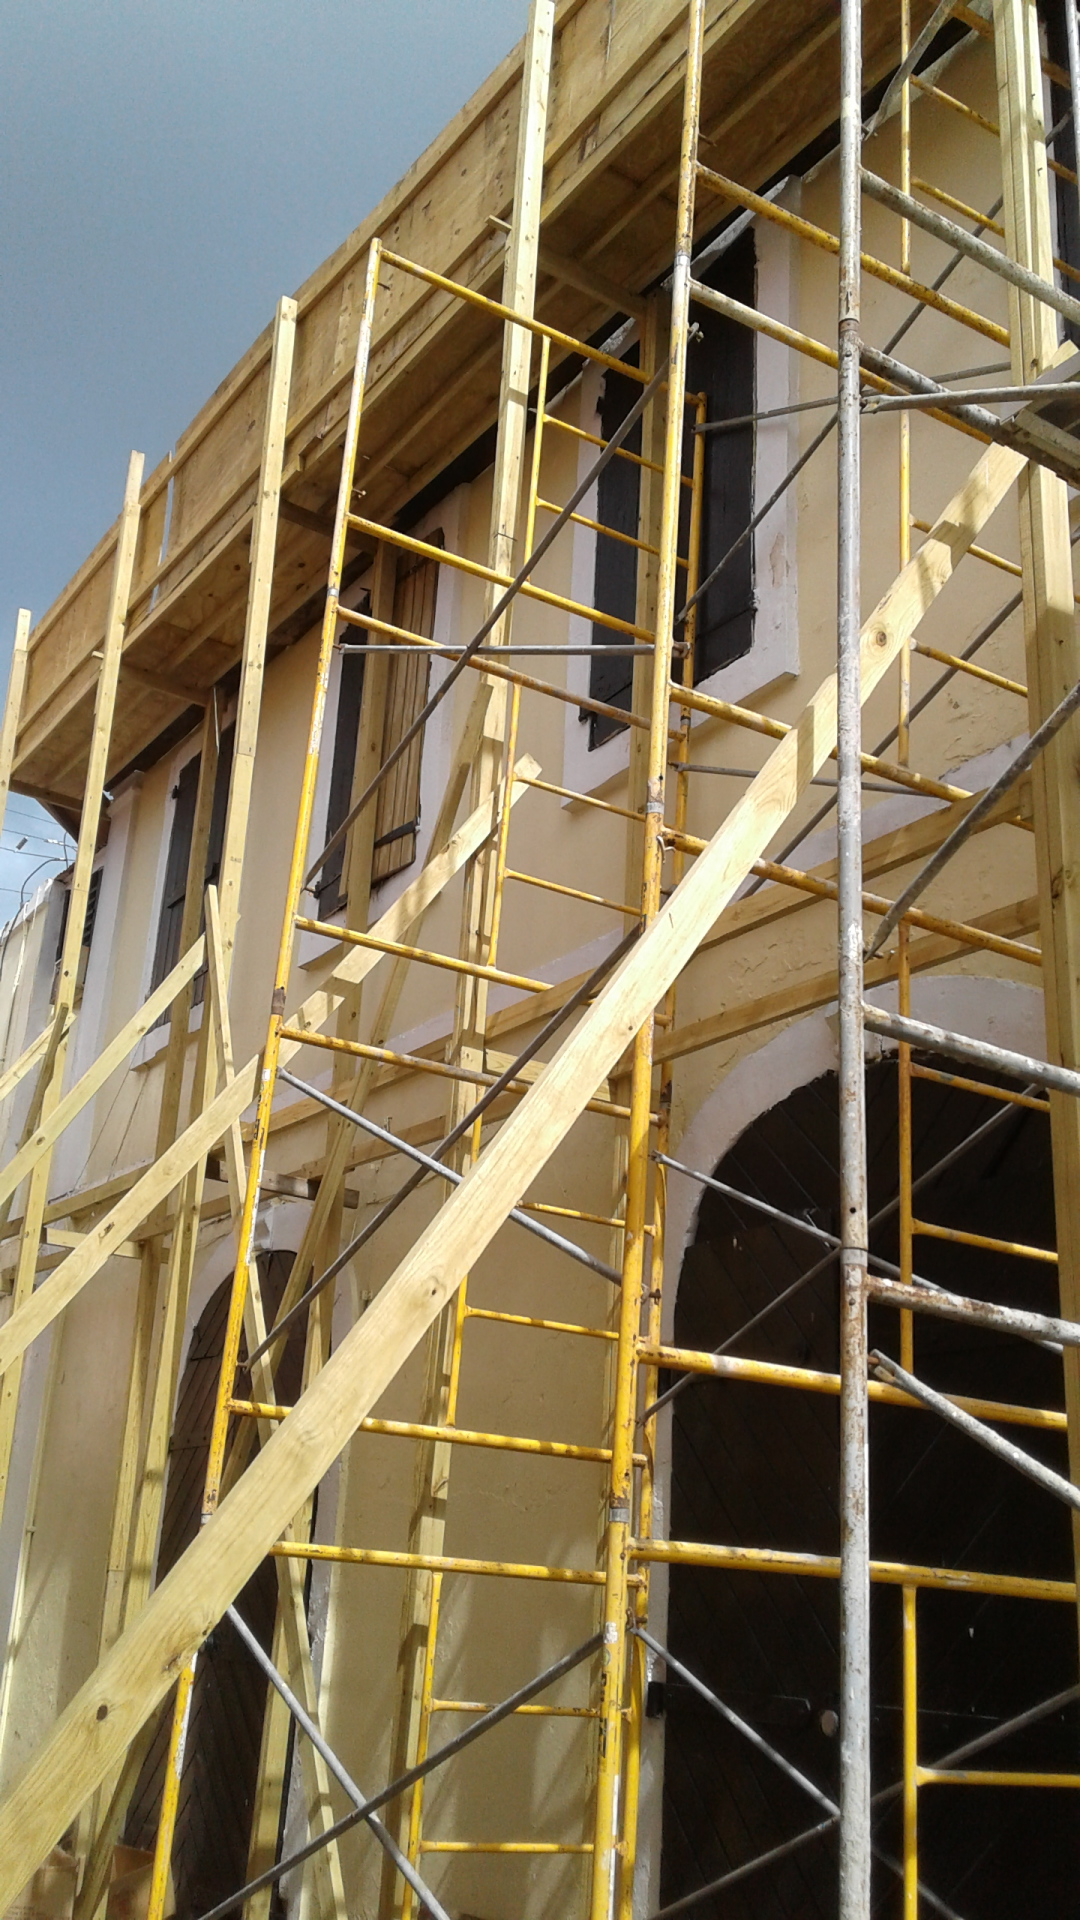 St. Thomas scaffolding